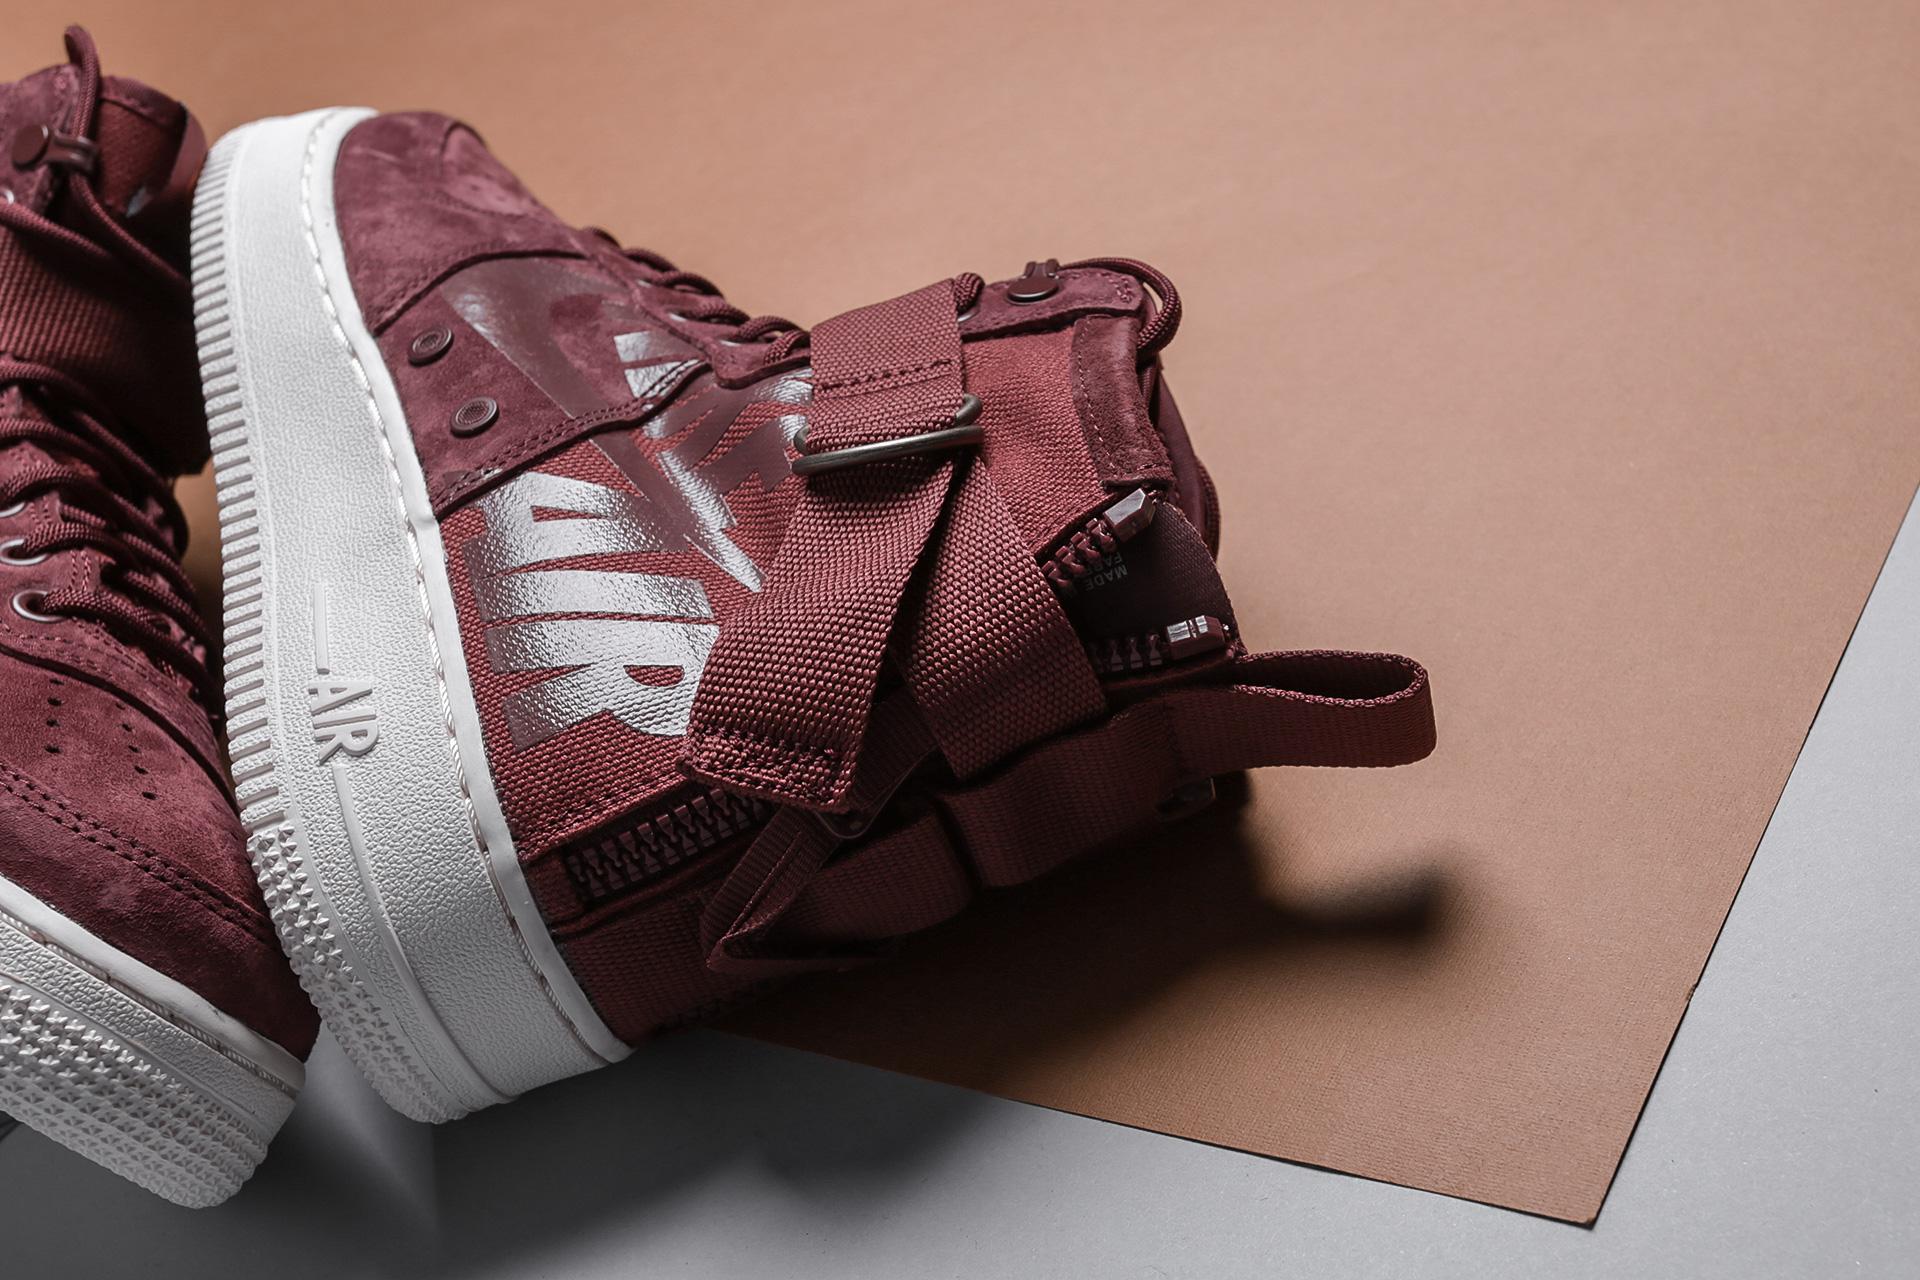 aa1ee4164b1c ... Купить мужские коричневые кроссовки Nike SF Air Force 1 Mid - фото 3  картинки ...